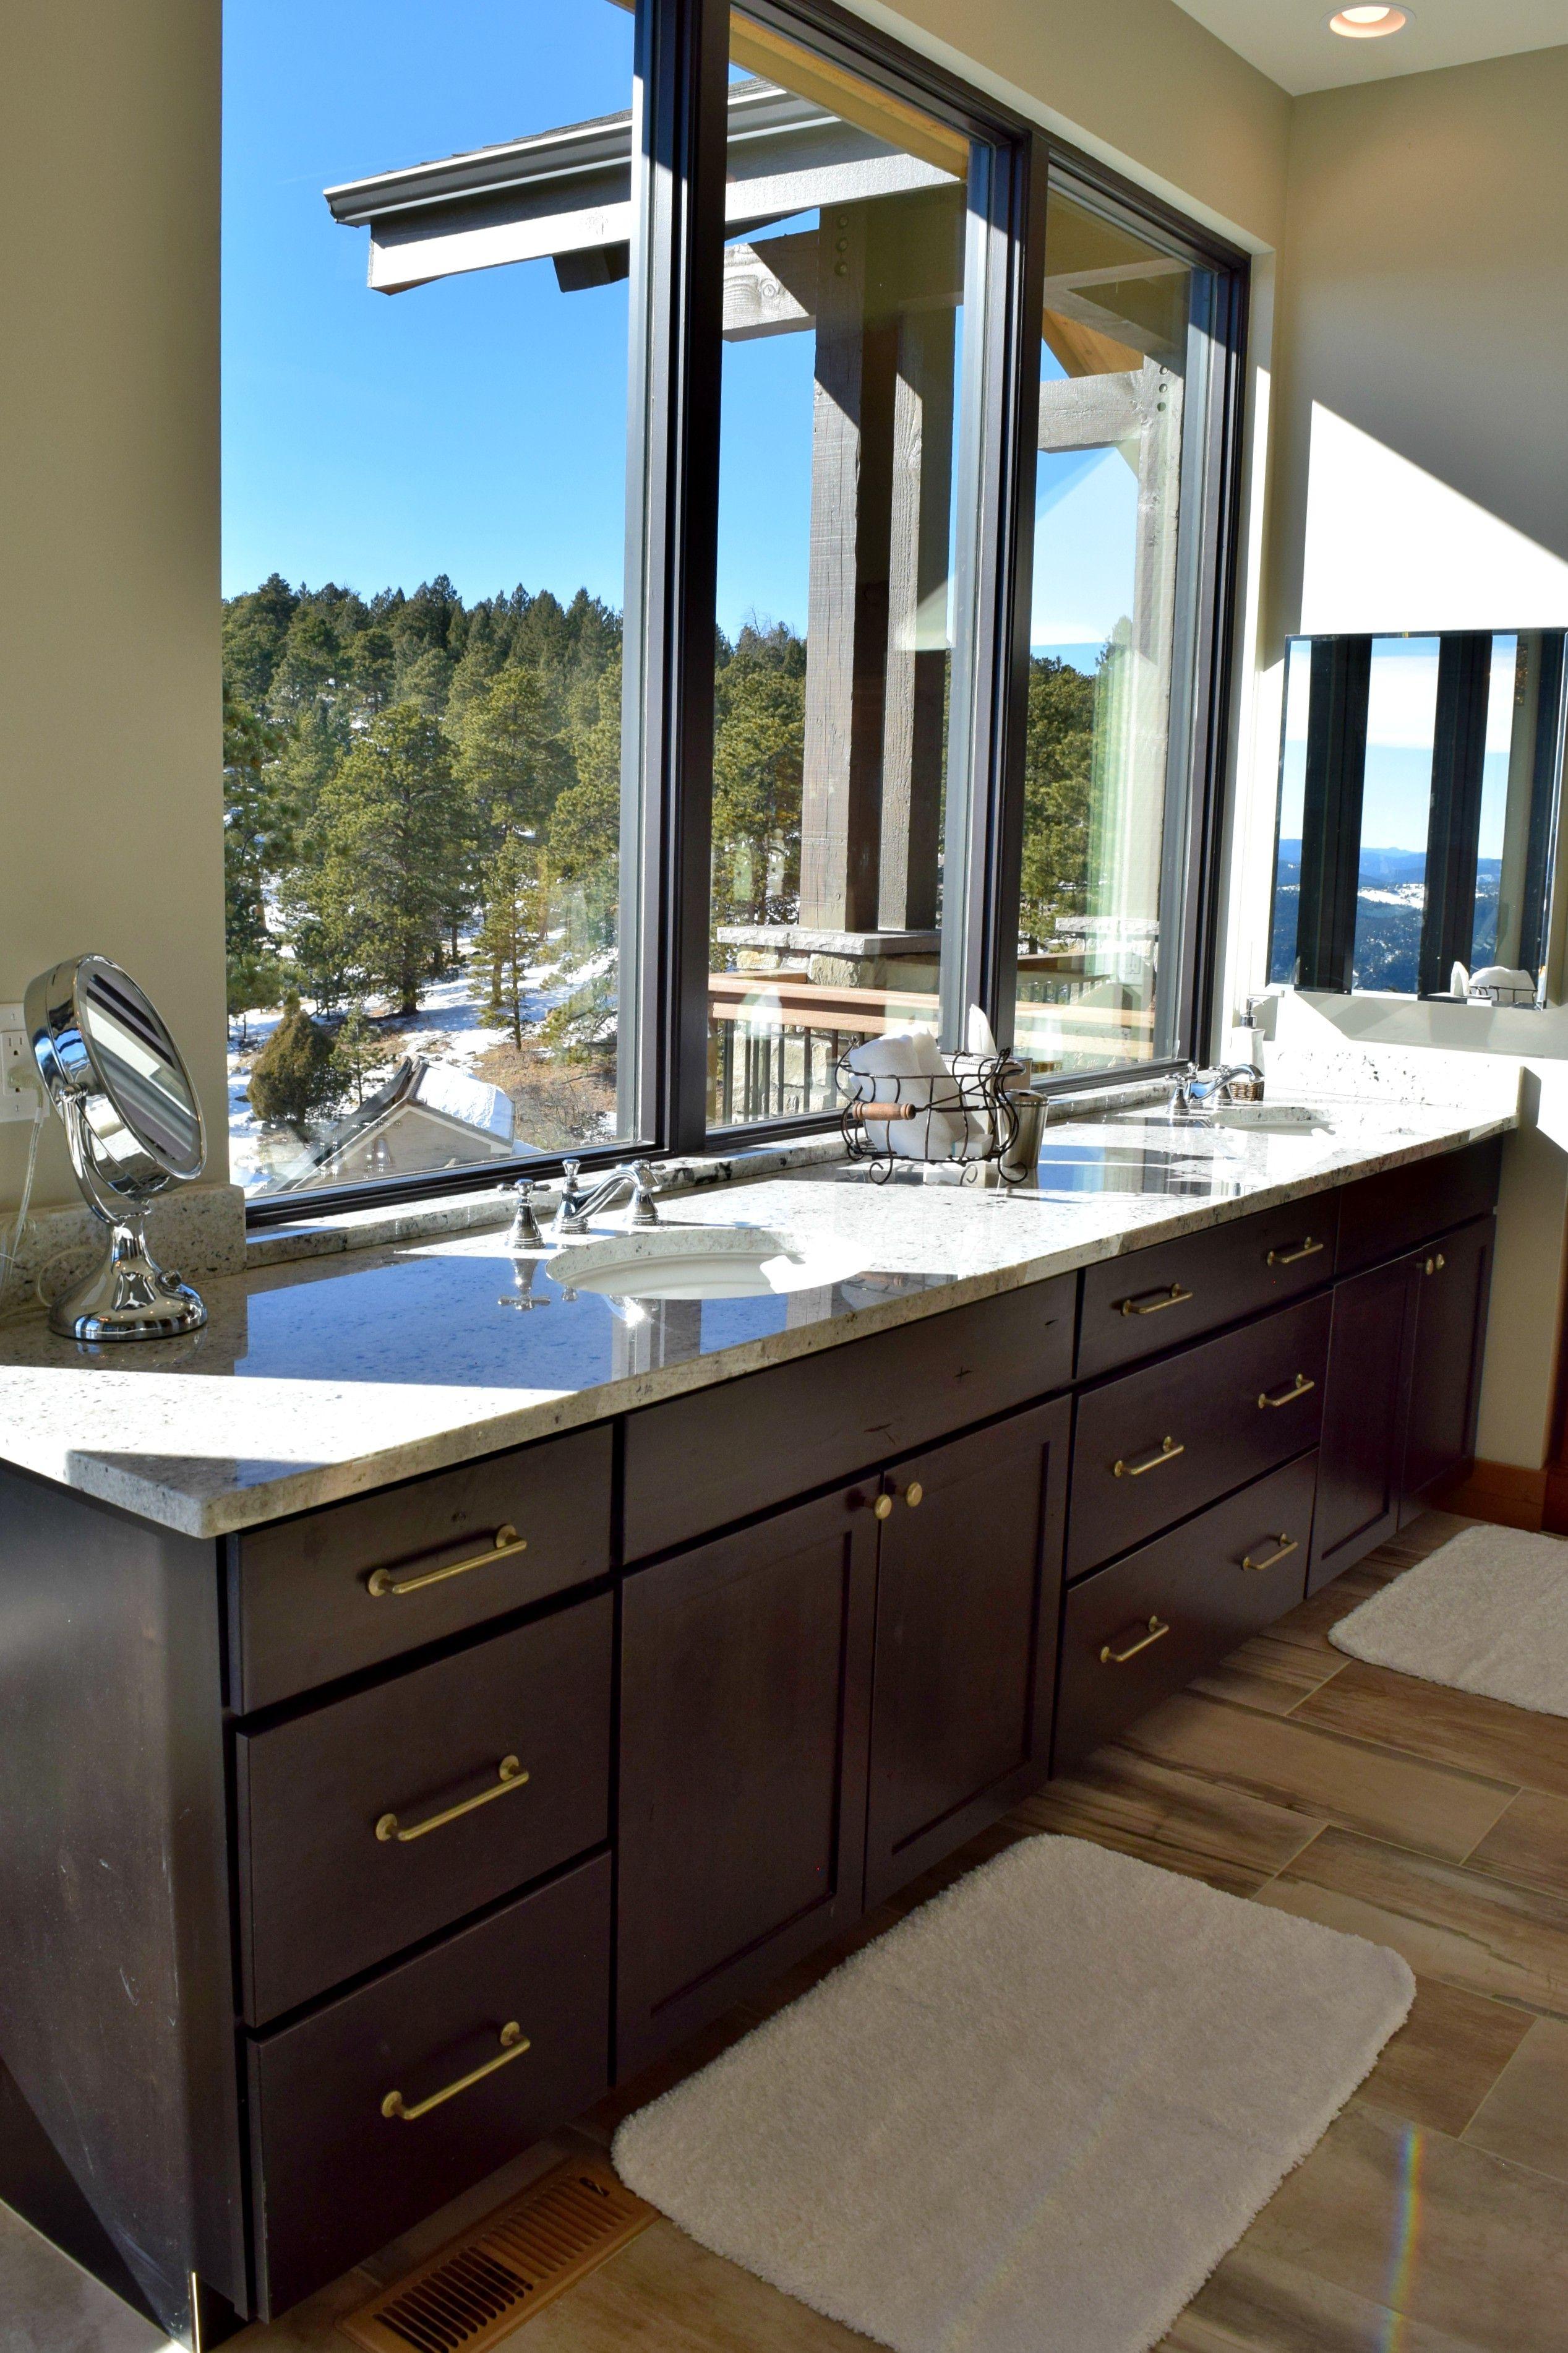 Bkc kitchen and bath semi custom cabinetry medallion - Semi custom bathroom vanity cabinets ...